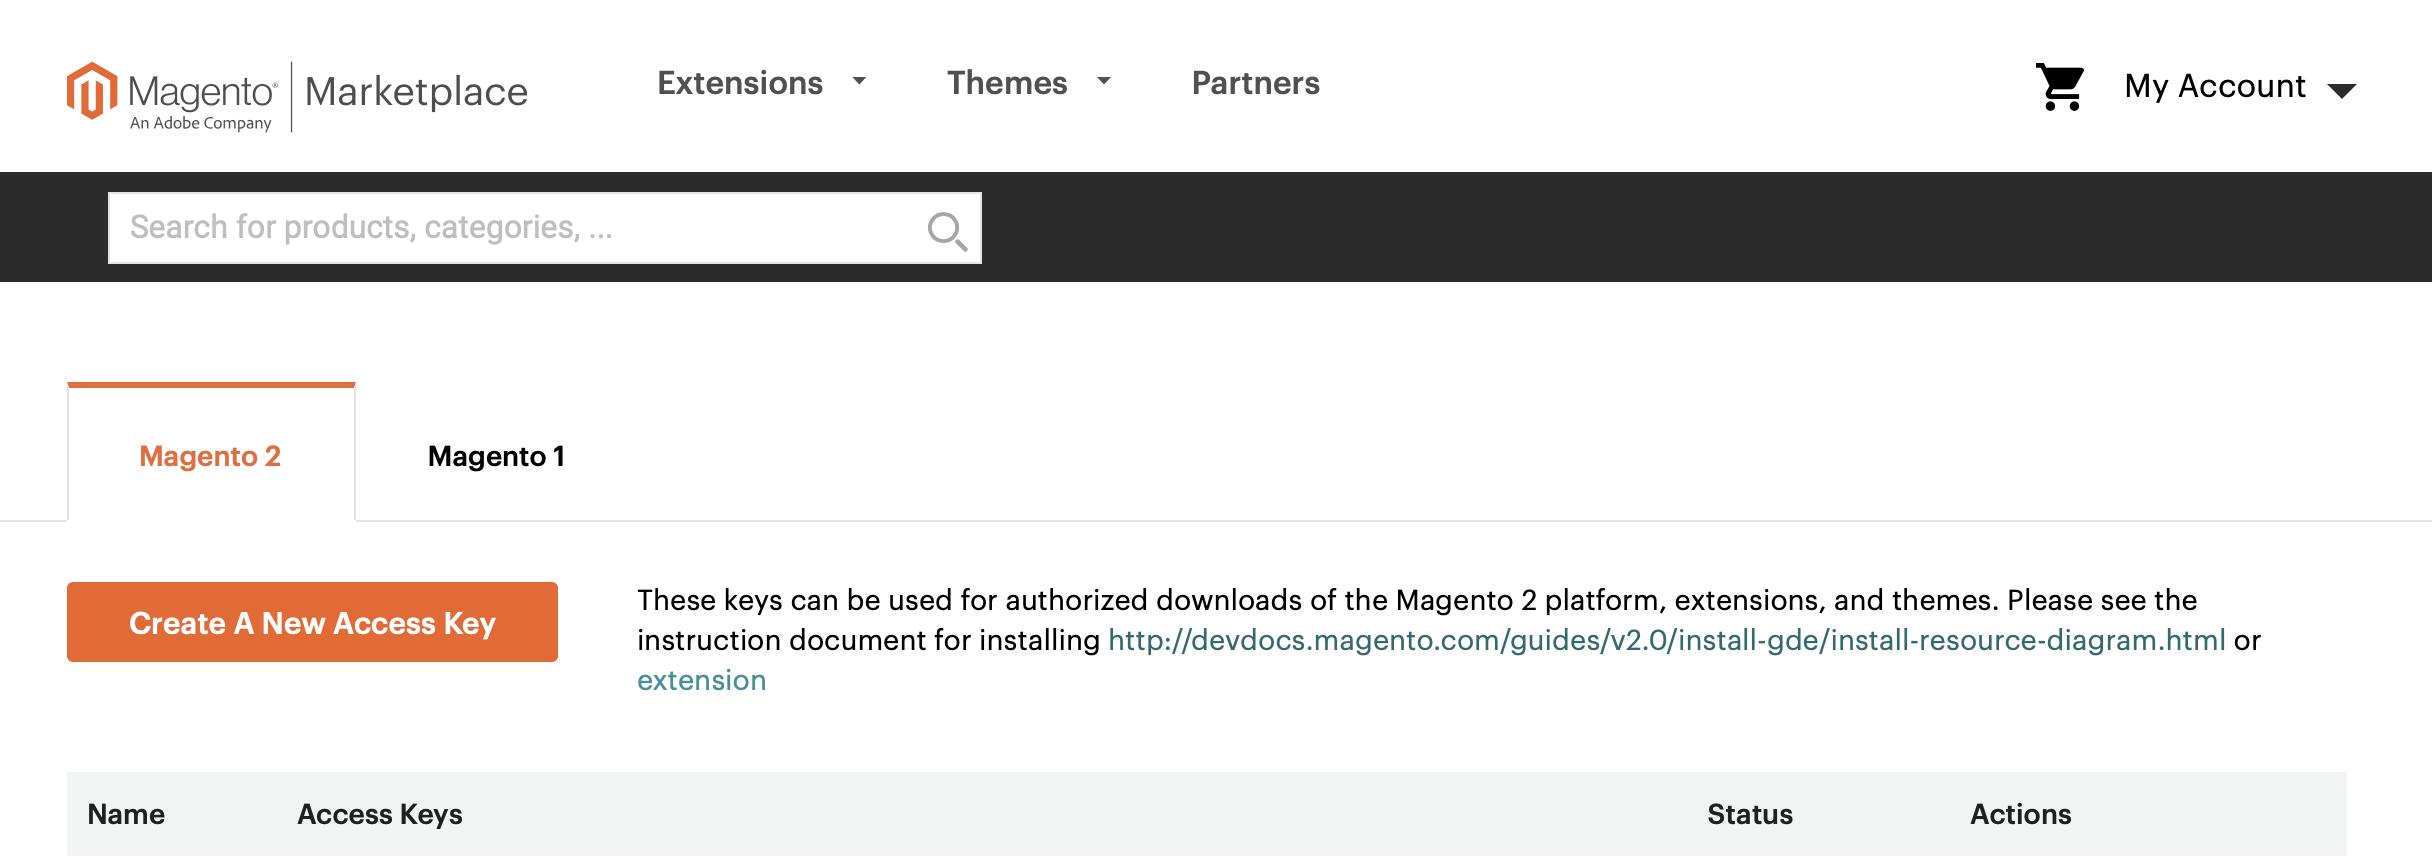 Magento Marketplace: Create A New Access Key